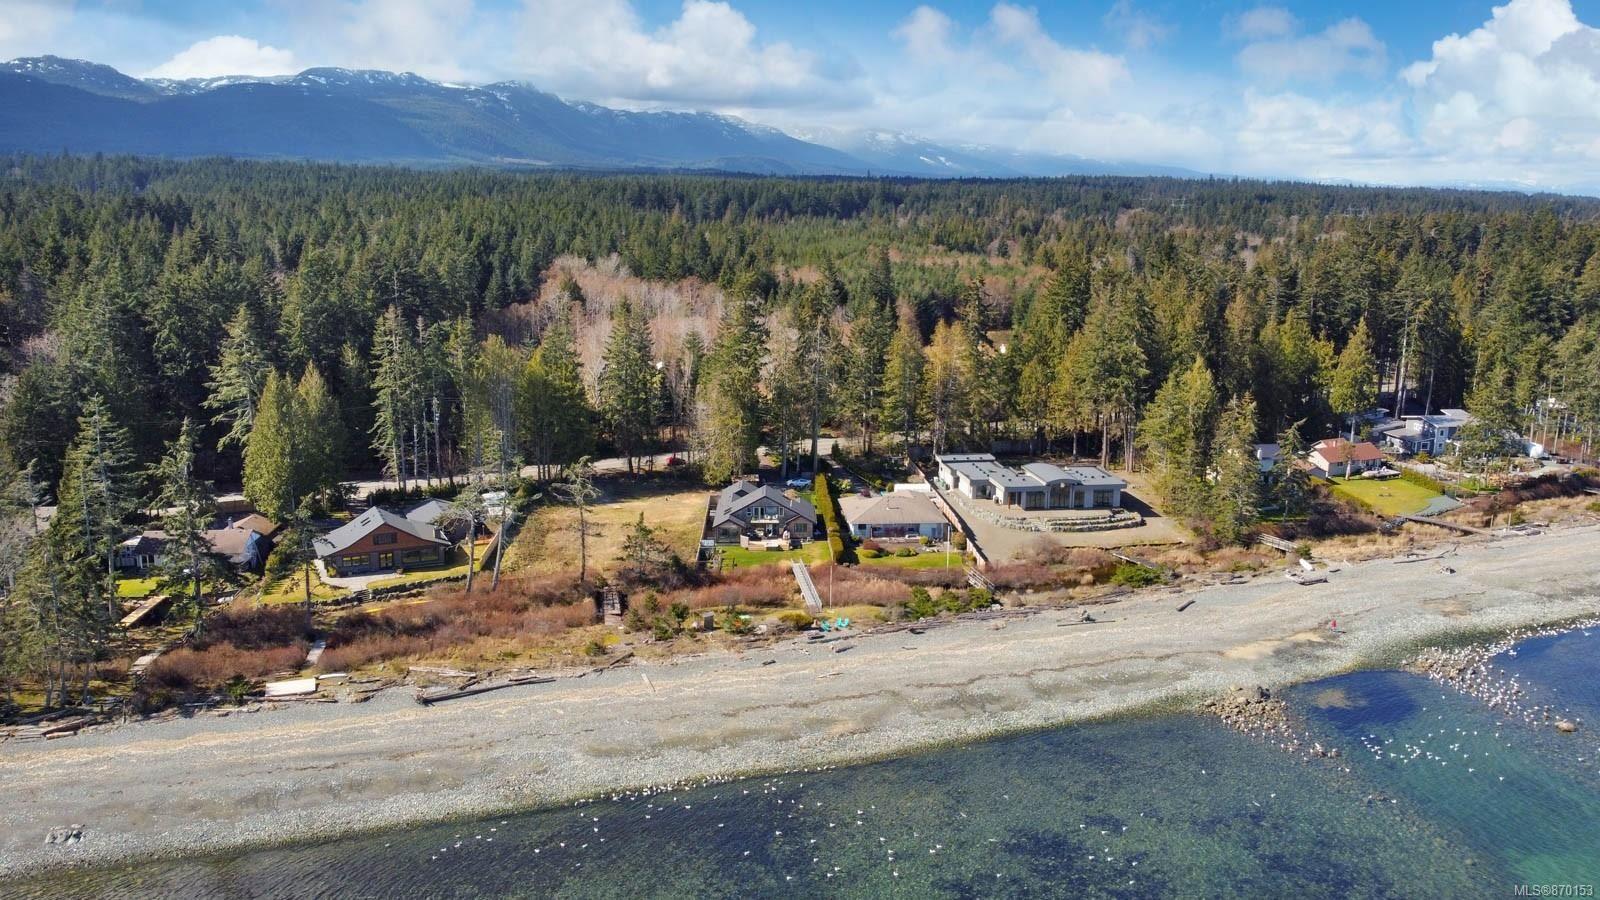 Main Photo: 6315 W Island Hwy in : PQ Qualicum Beach House for sale (Parksville/Qualicum)  : MLS®# 870153